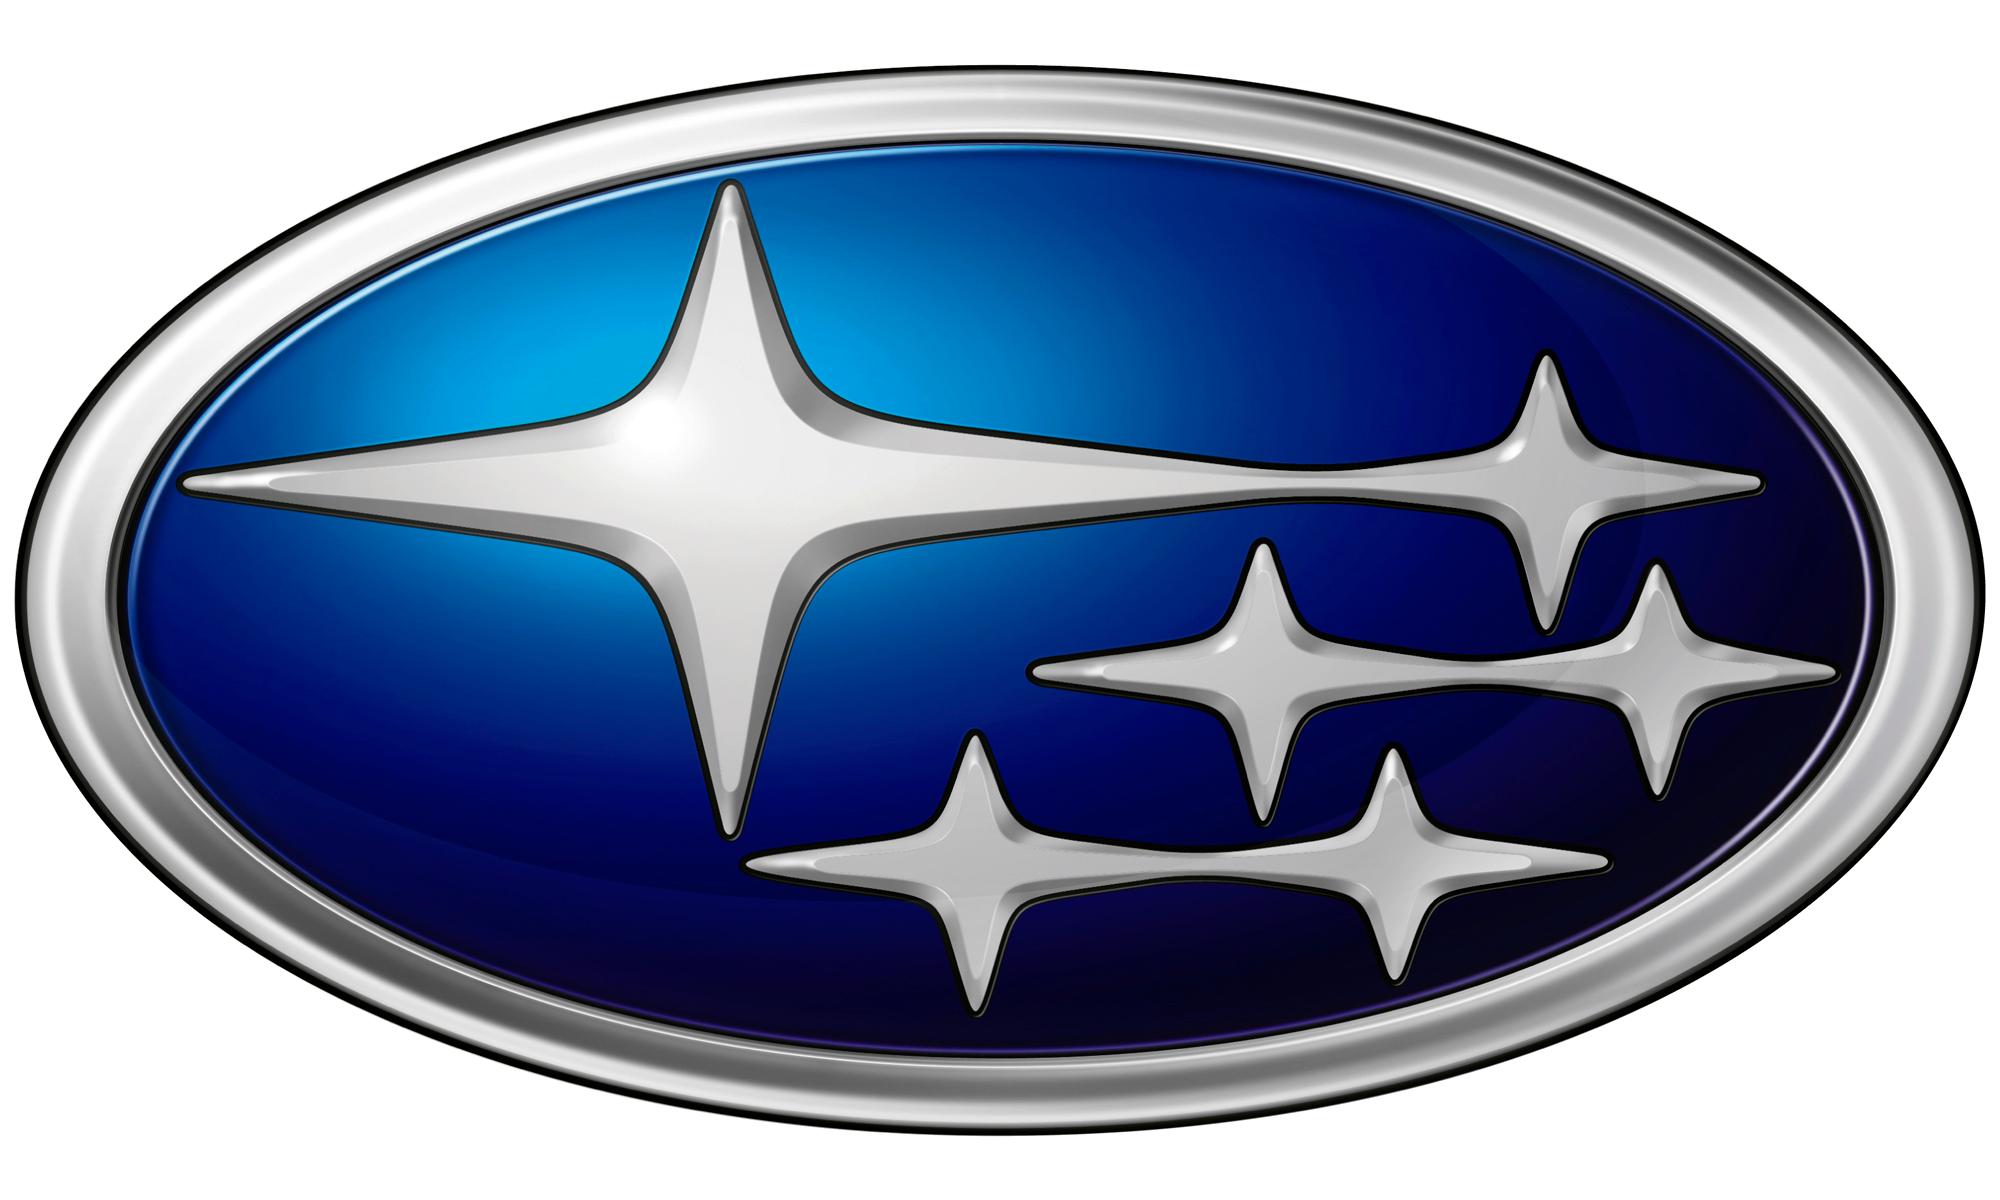 Subaru Logo PNG Image